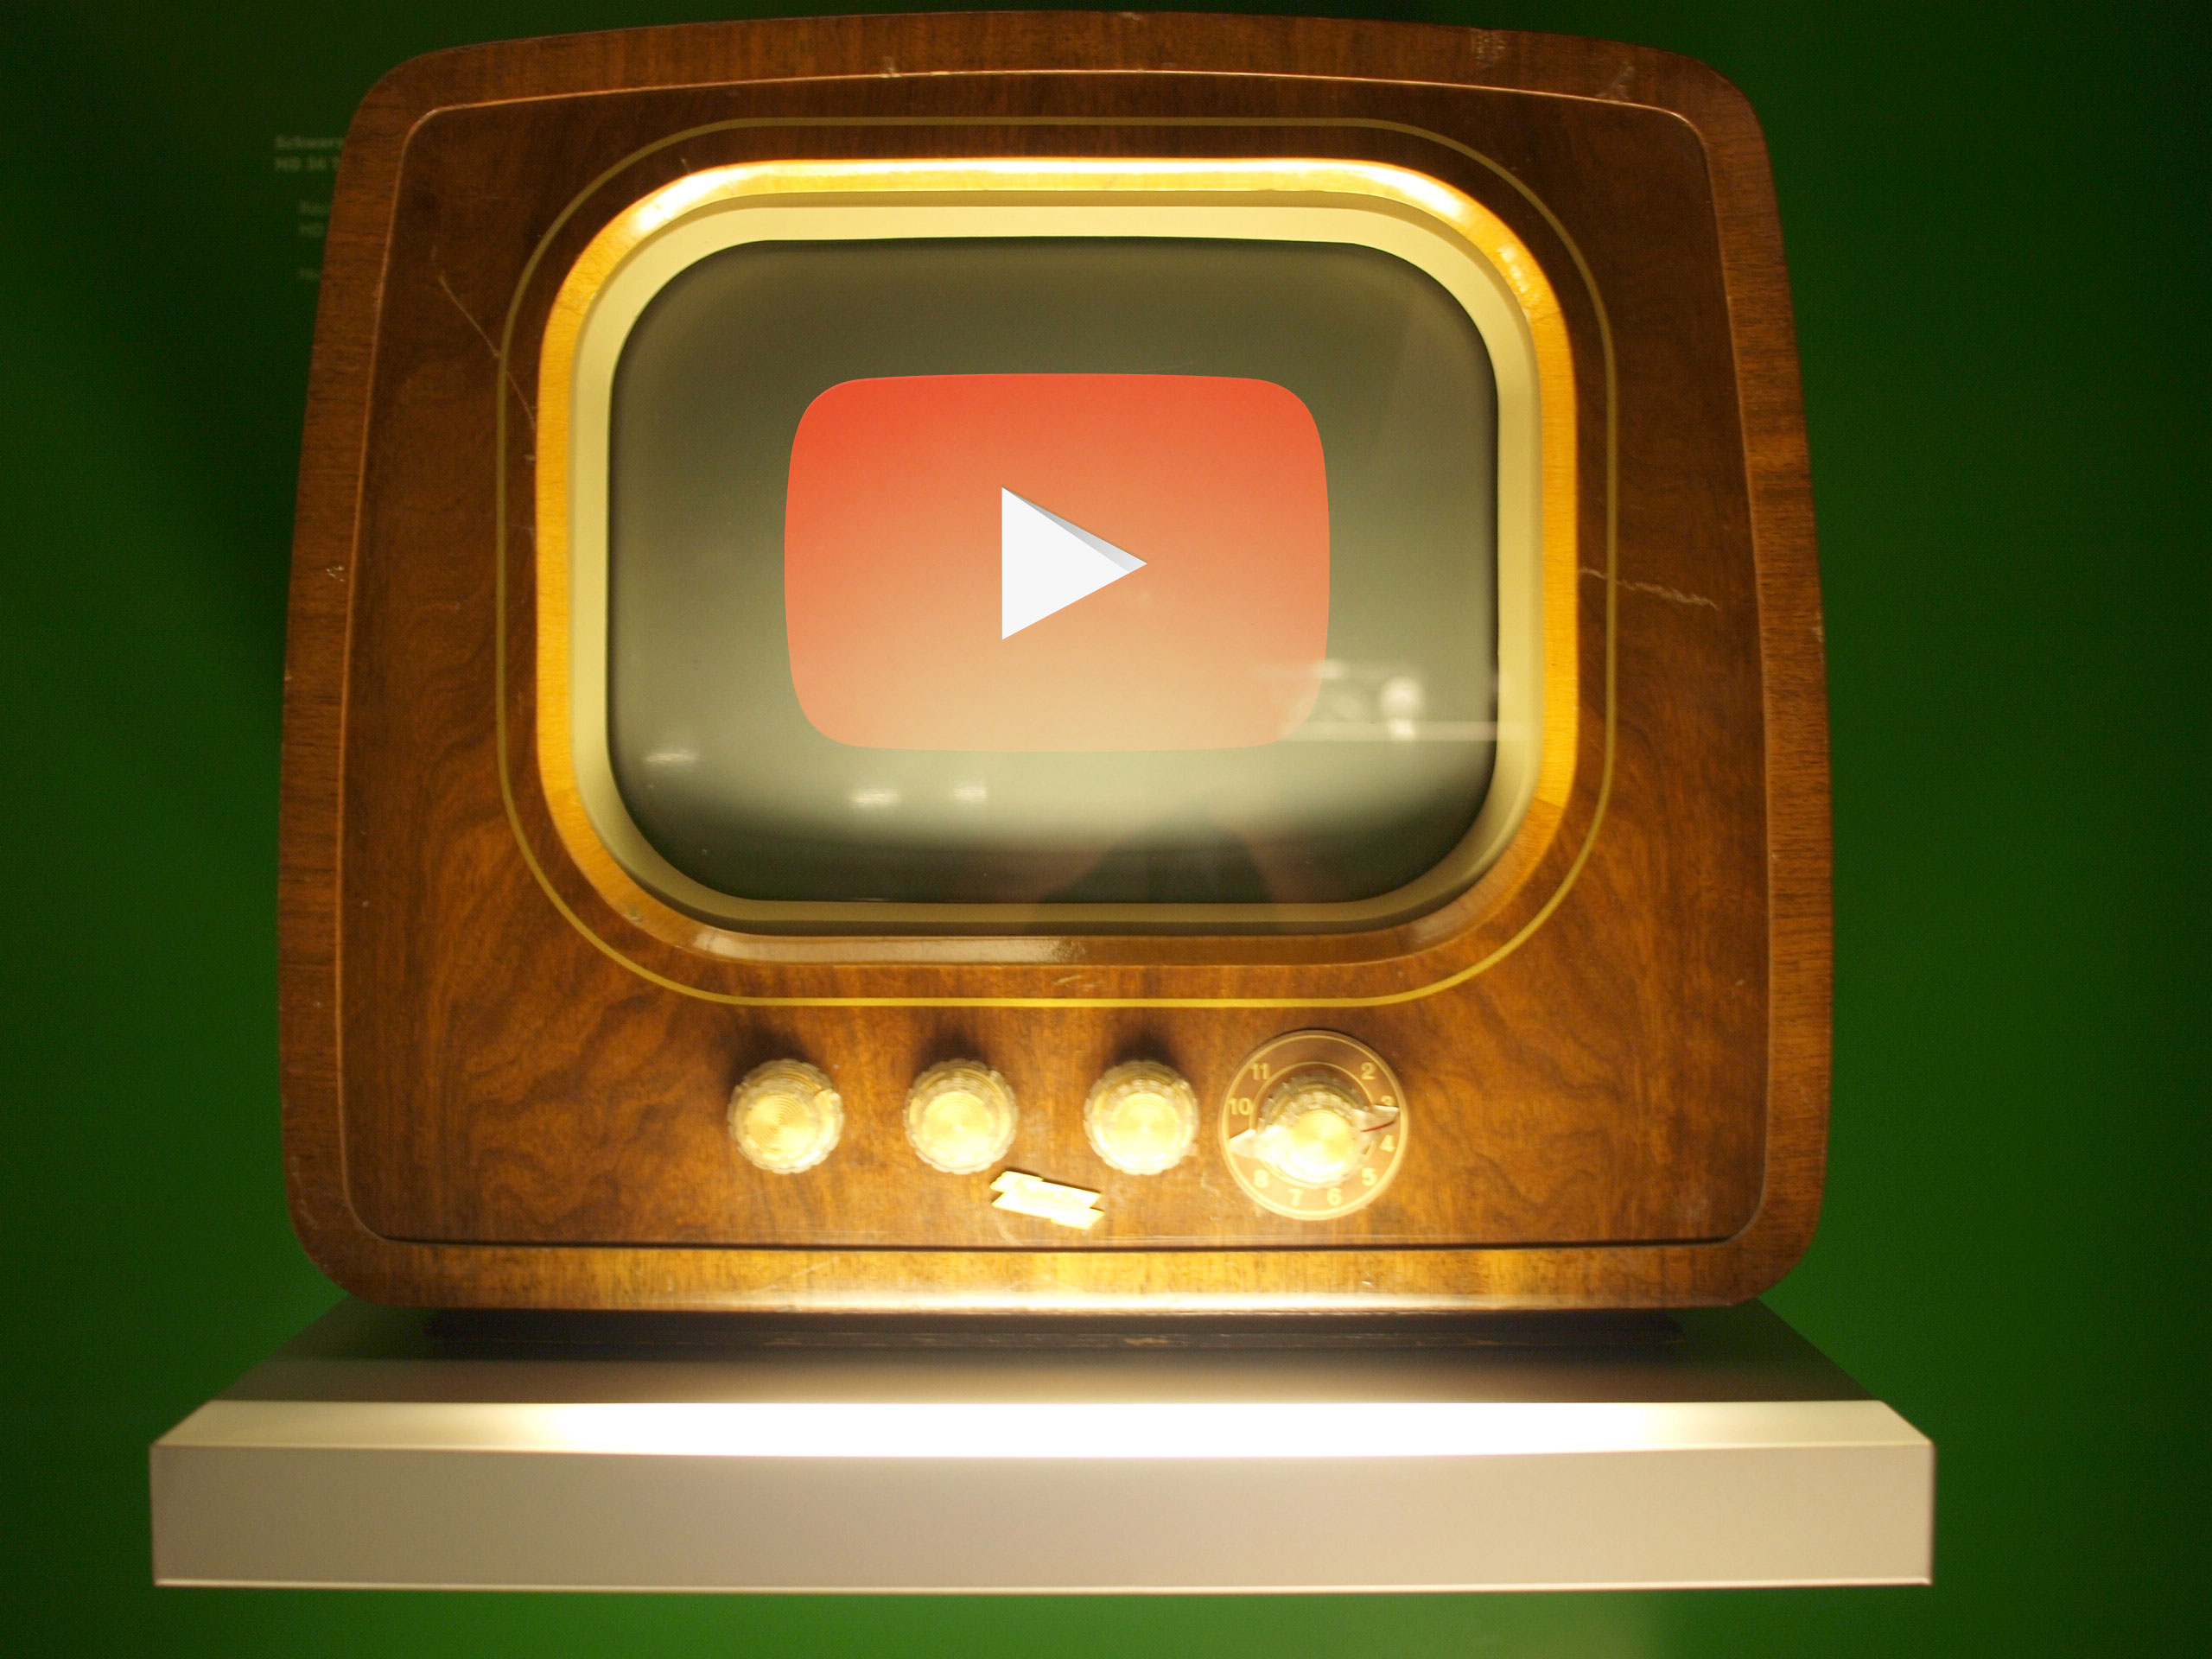 Old TV set - YouTube